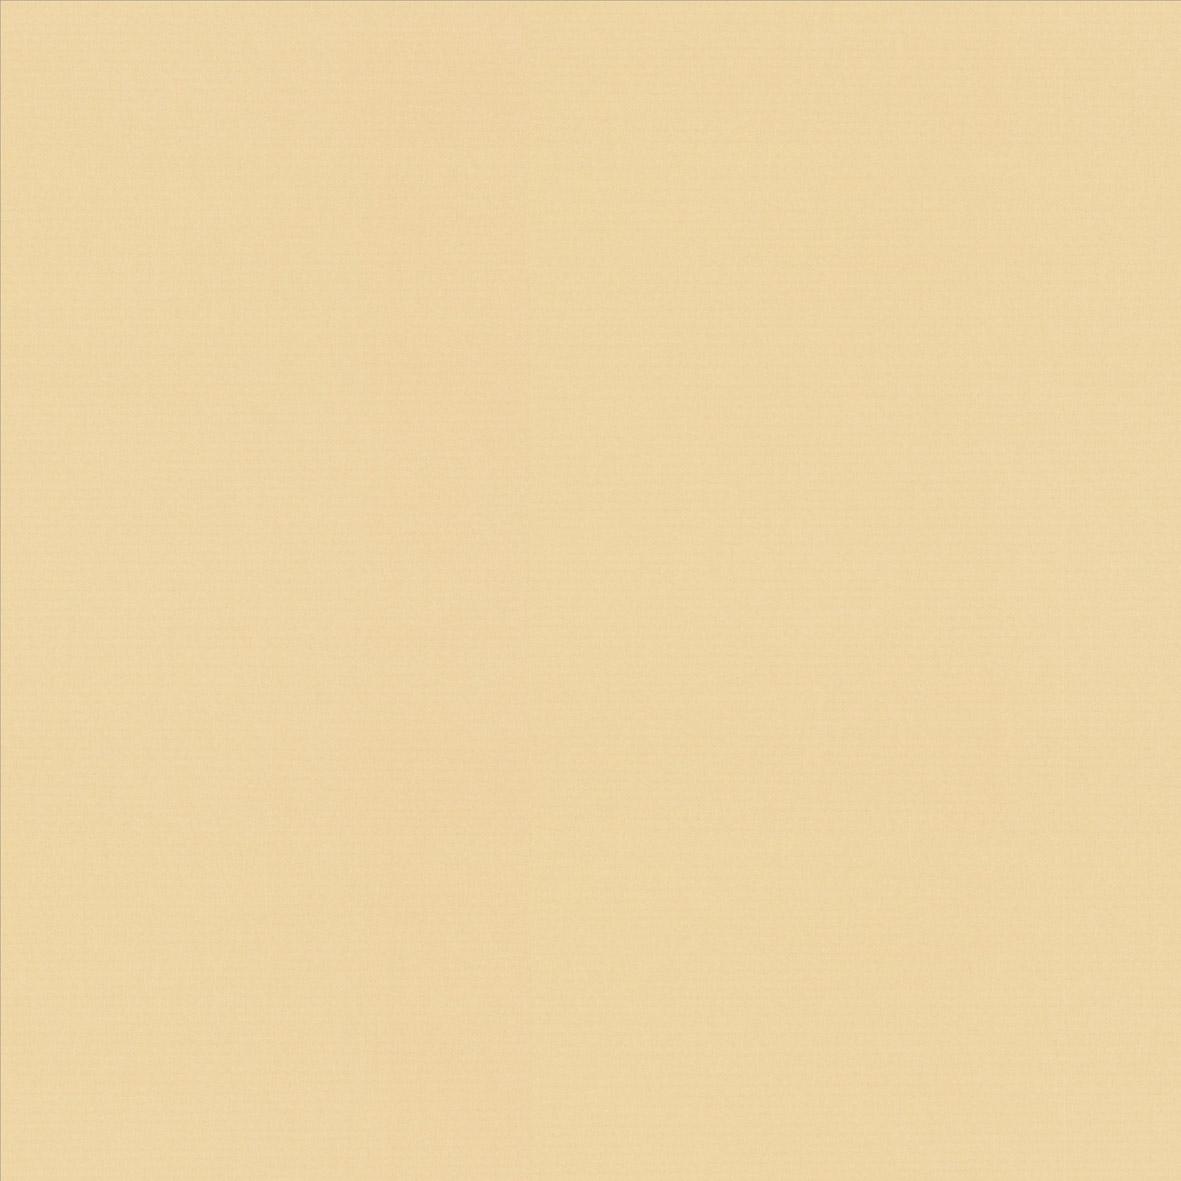 Roller_Swatch_Topaz_Gold_RE3192